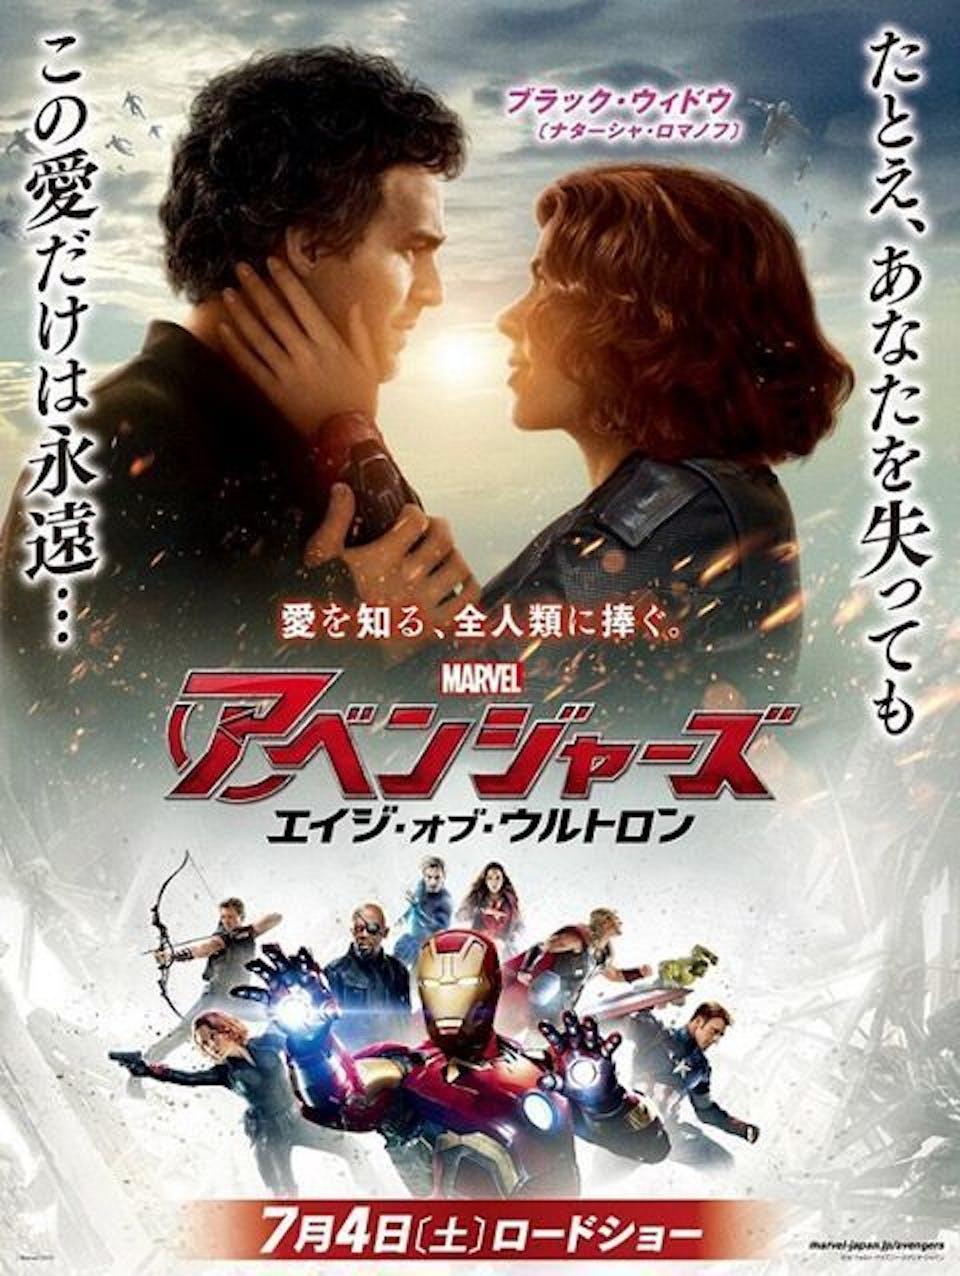 Japanese 'Avengers: Age of Ultron' (2015) poster for Marvel